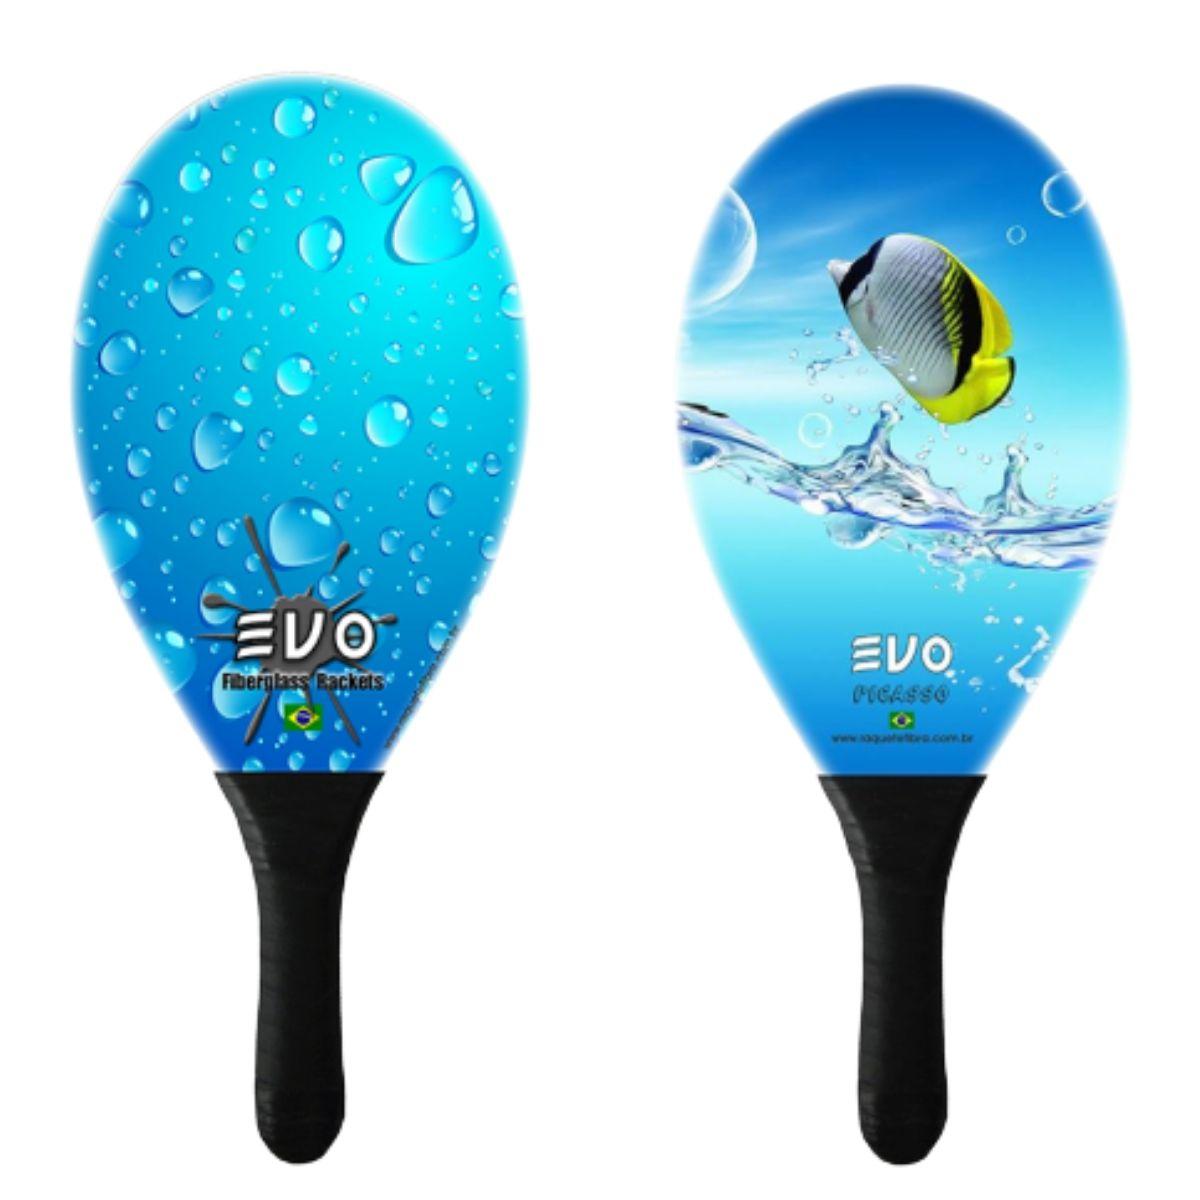 Kit Frescobol 2 Raquetes Fibro De Vidro Evo Agua Peixe